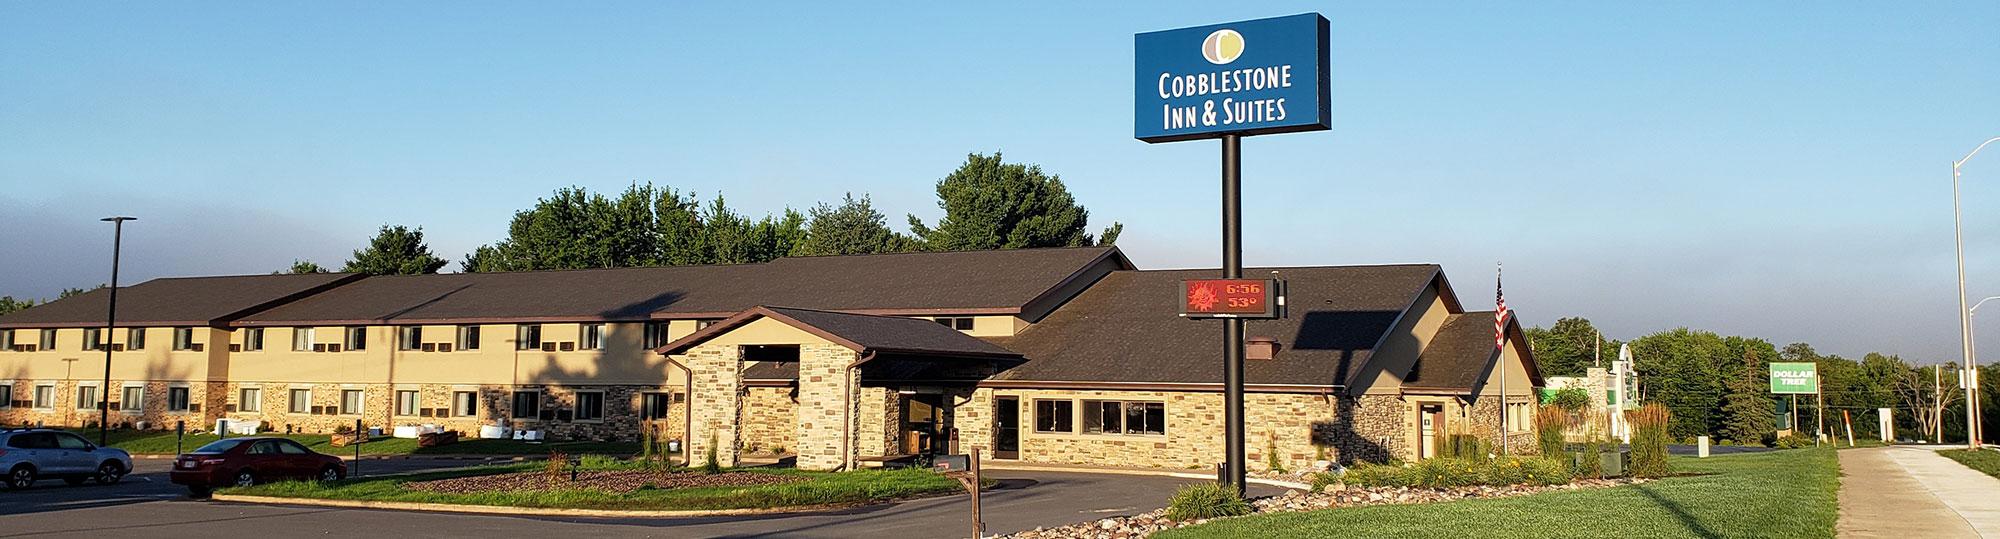 Cobblestone Inn & Suites Merrill